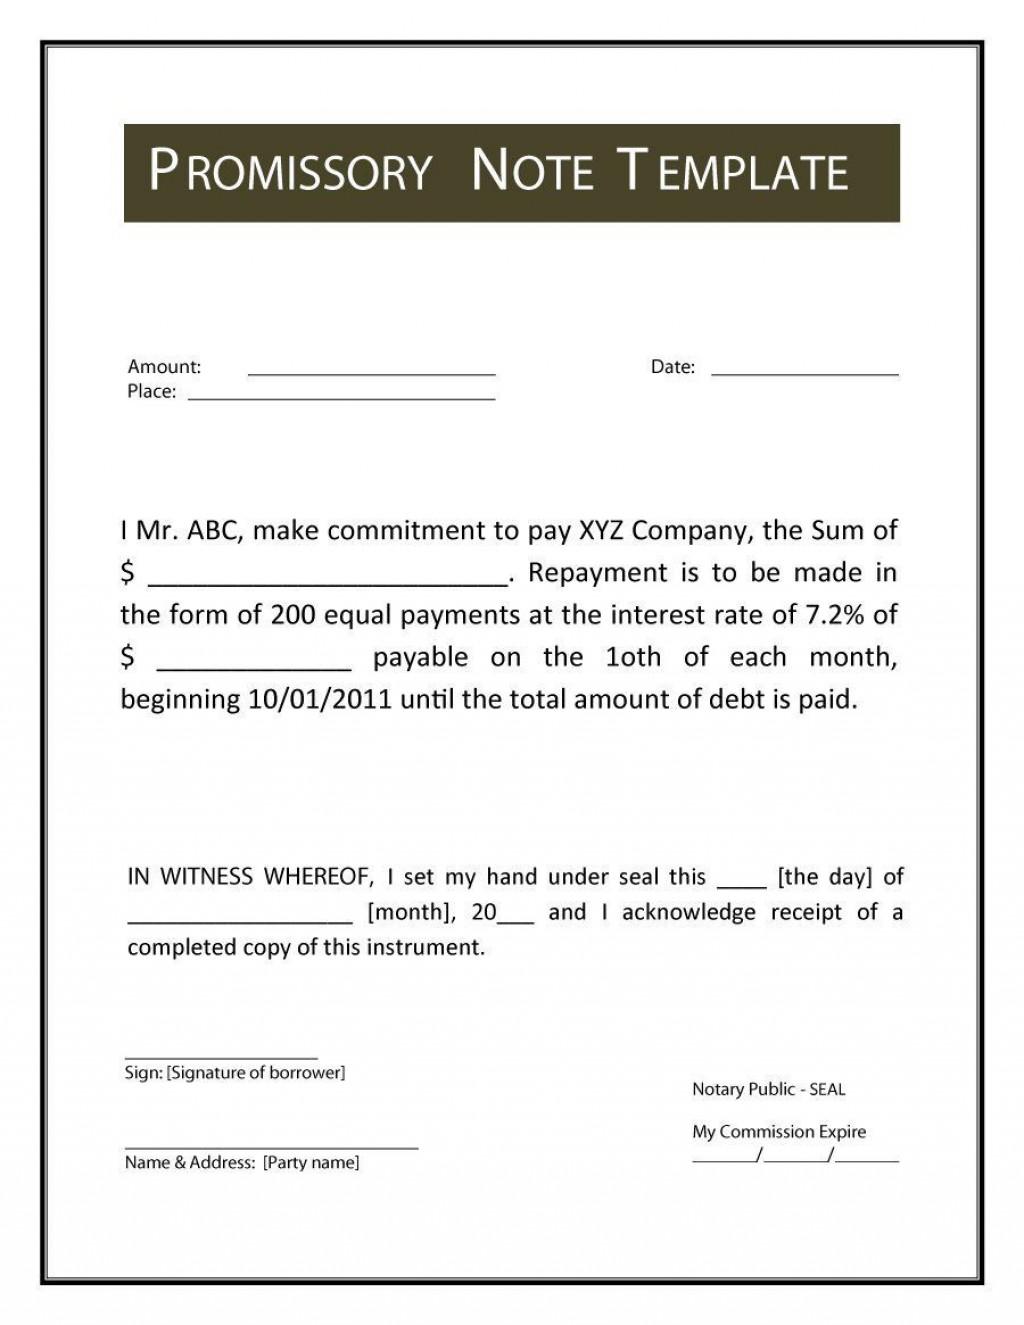 000 Breathtaking Free Promissory Note Template Word Image  Microsoft DocumentLarge